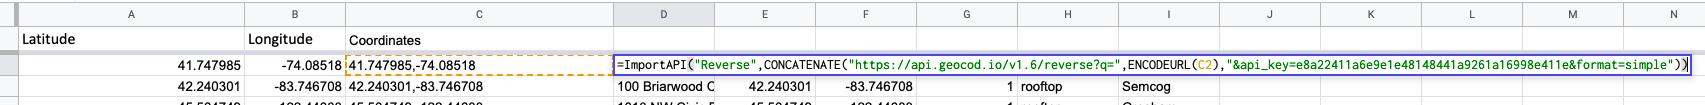 "Showing function in a cell: =ImportAPI(""Geocodio"",CONCATENATE(""https://api.geocod.io/v1.6/reverse?q="",ENCODEURL(E2),""&api_key=YOUR_API_KEY&format=simple""))"